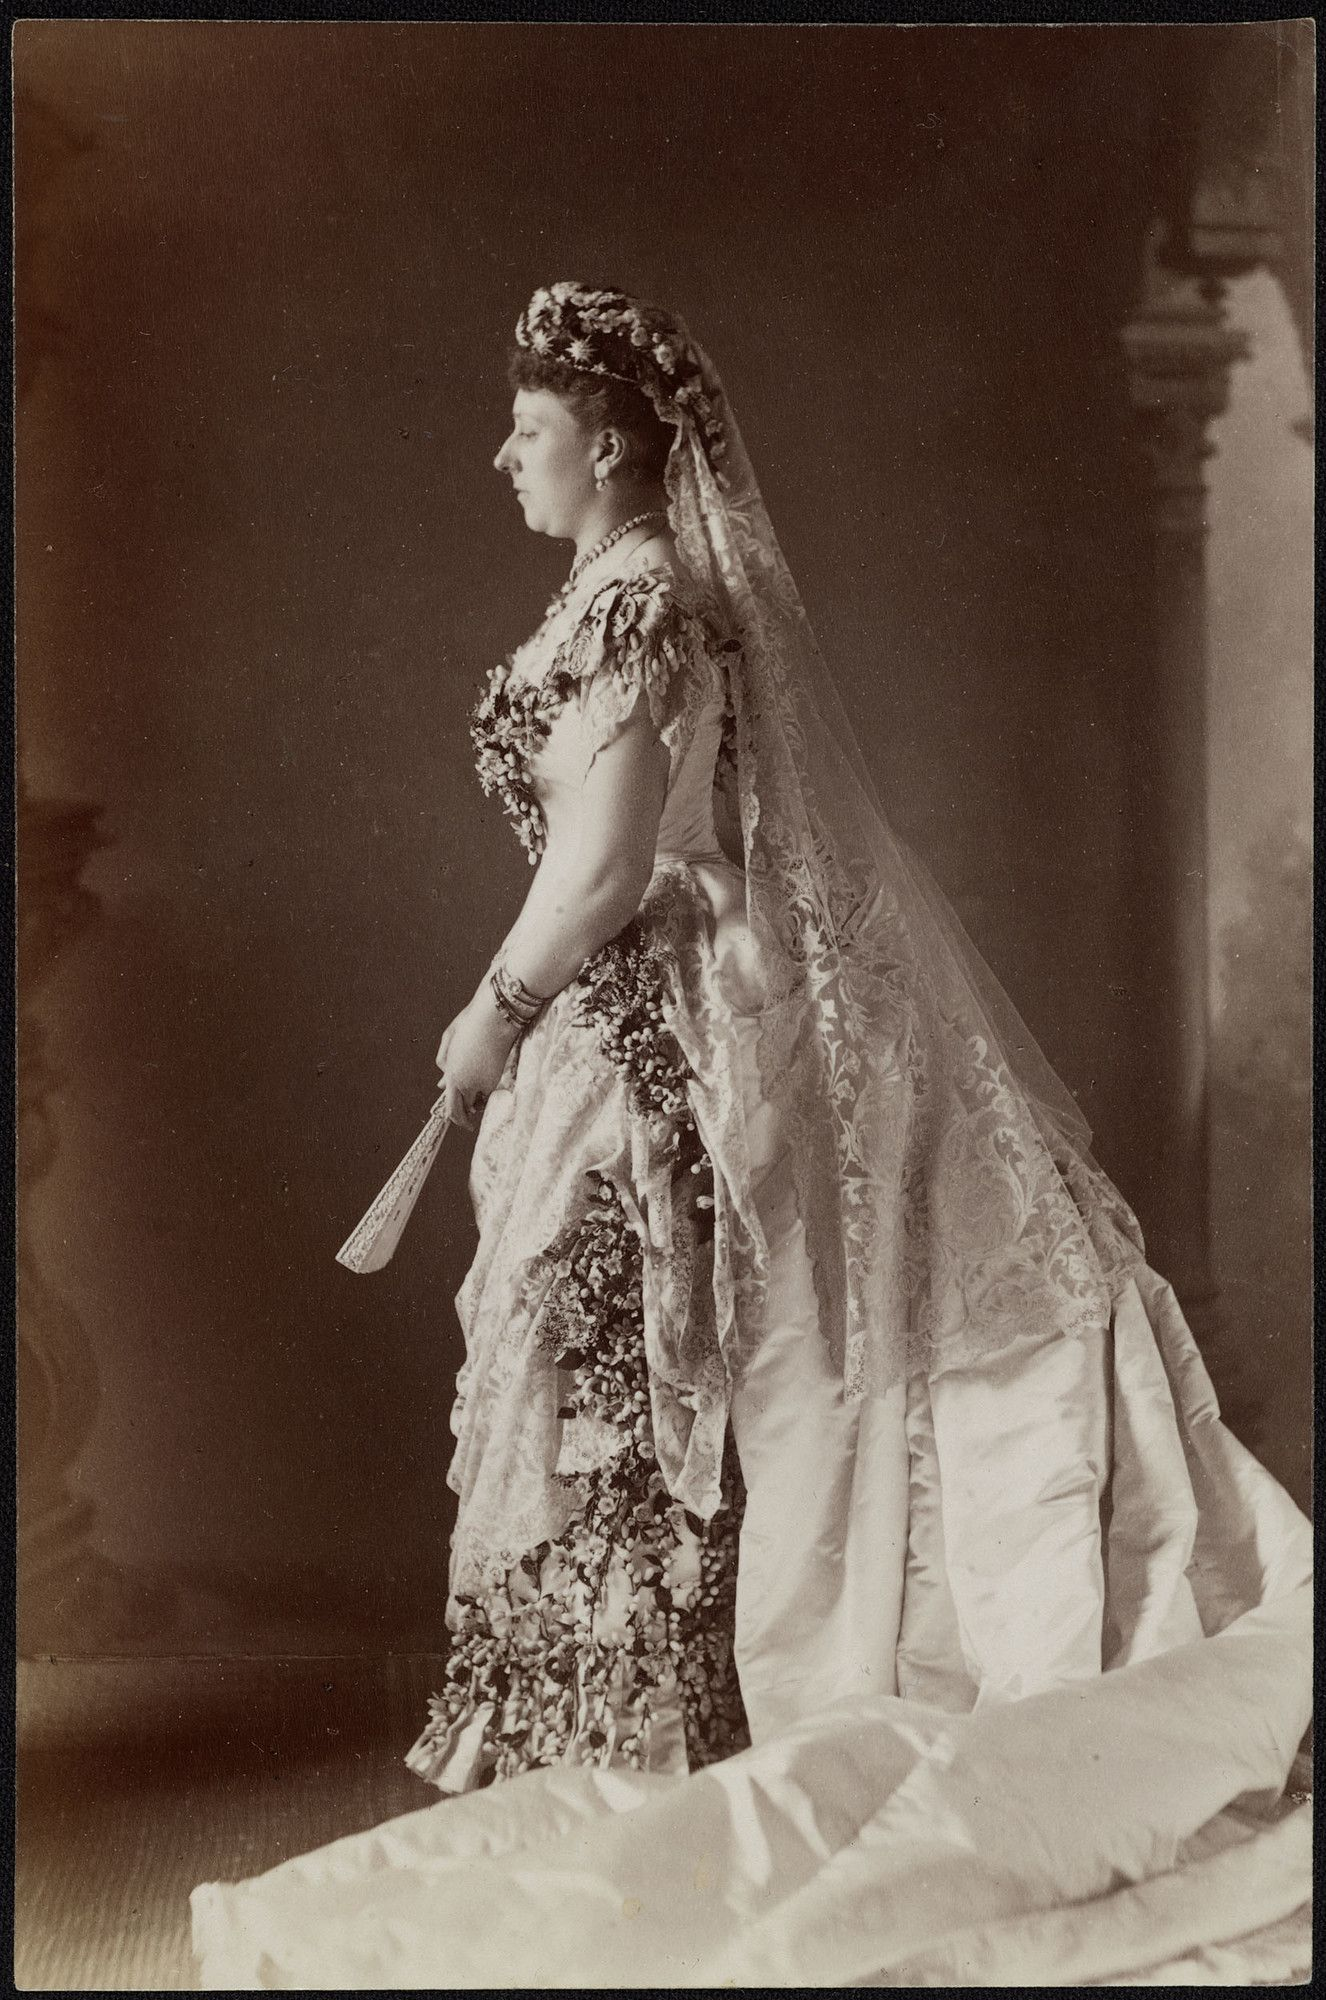 Princess Beatrice (18571944) in her wedding dress 23 Jul